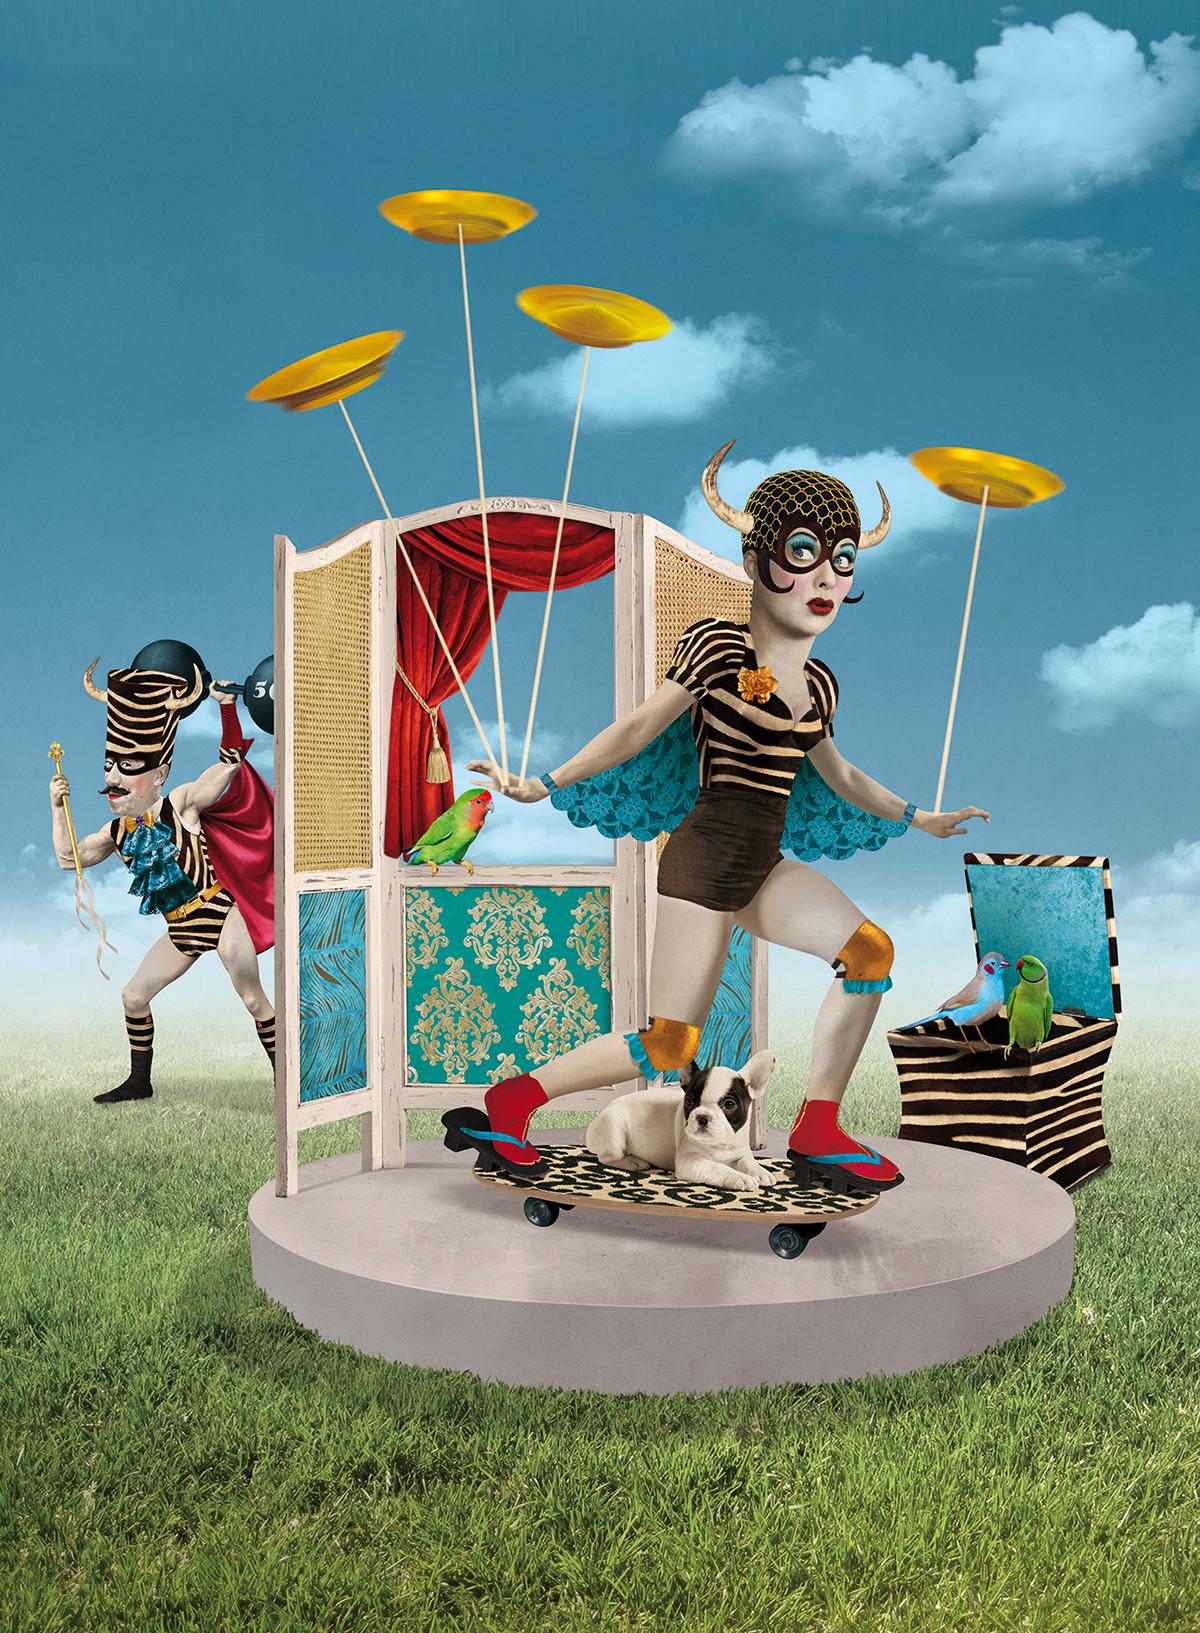 Mercateatre StMArtí ilustracion circo Animación de calle cartel Artes escenicas